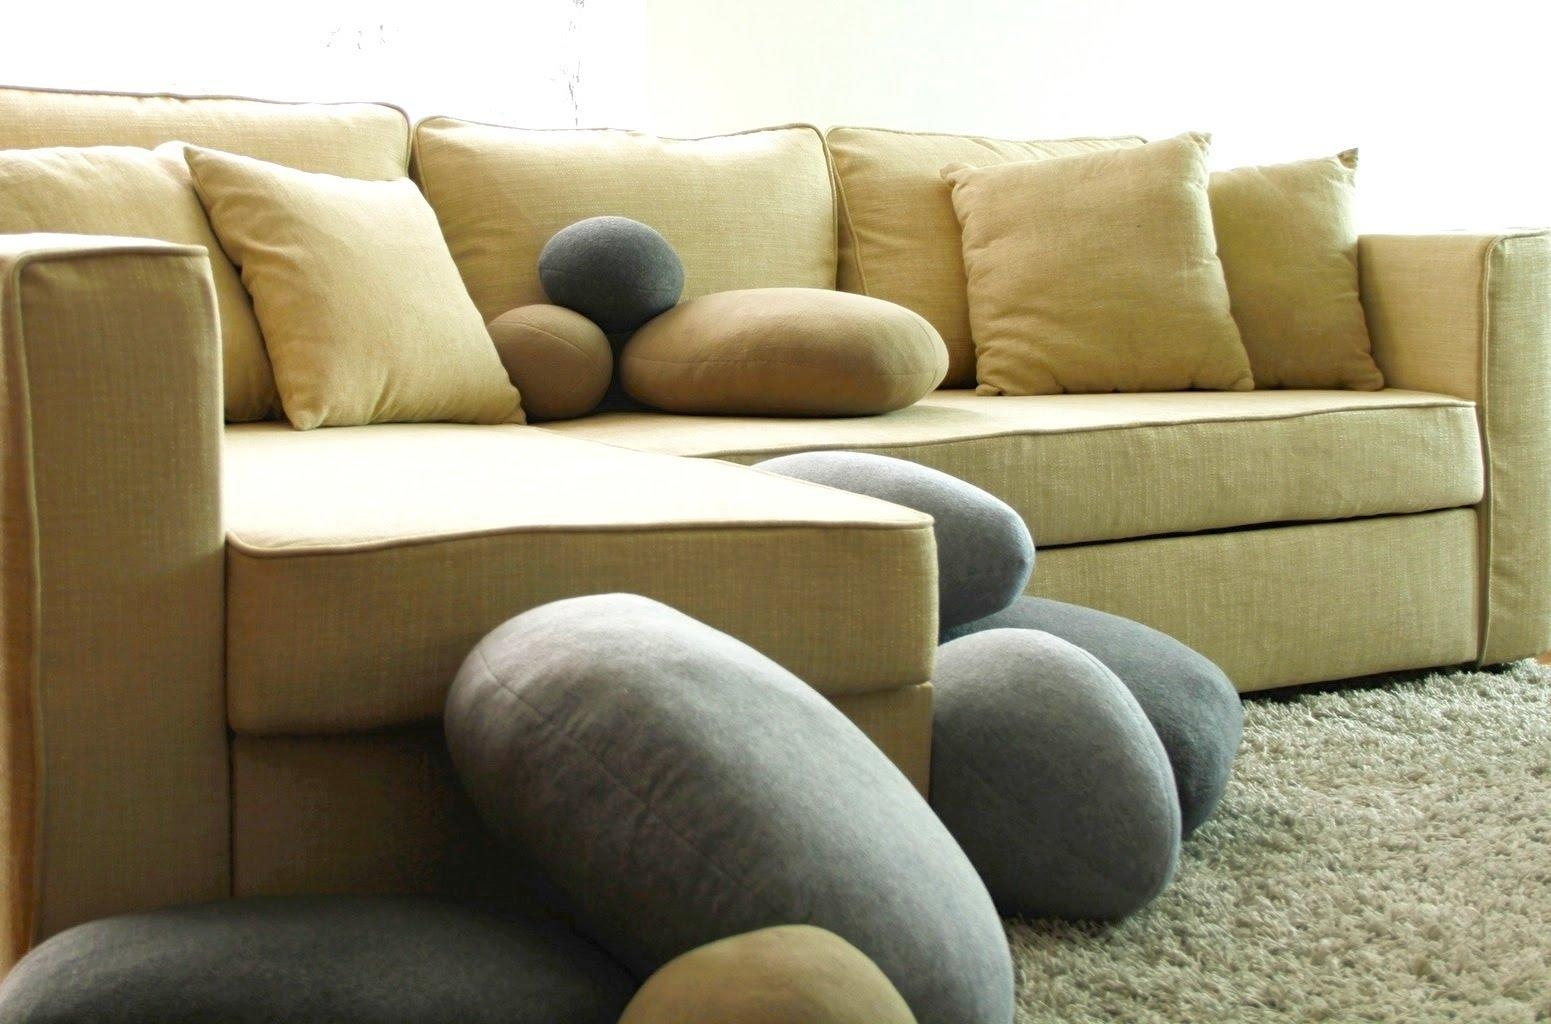 Slipcover For Ikea Manstad Sofa Bed – Snug Fit Version – Youtube Regarding Manstad Sofa Bed (Image 19 of 20)